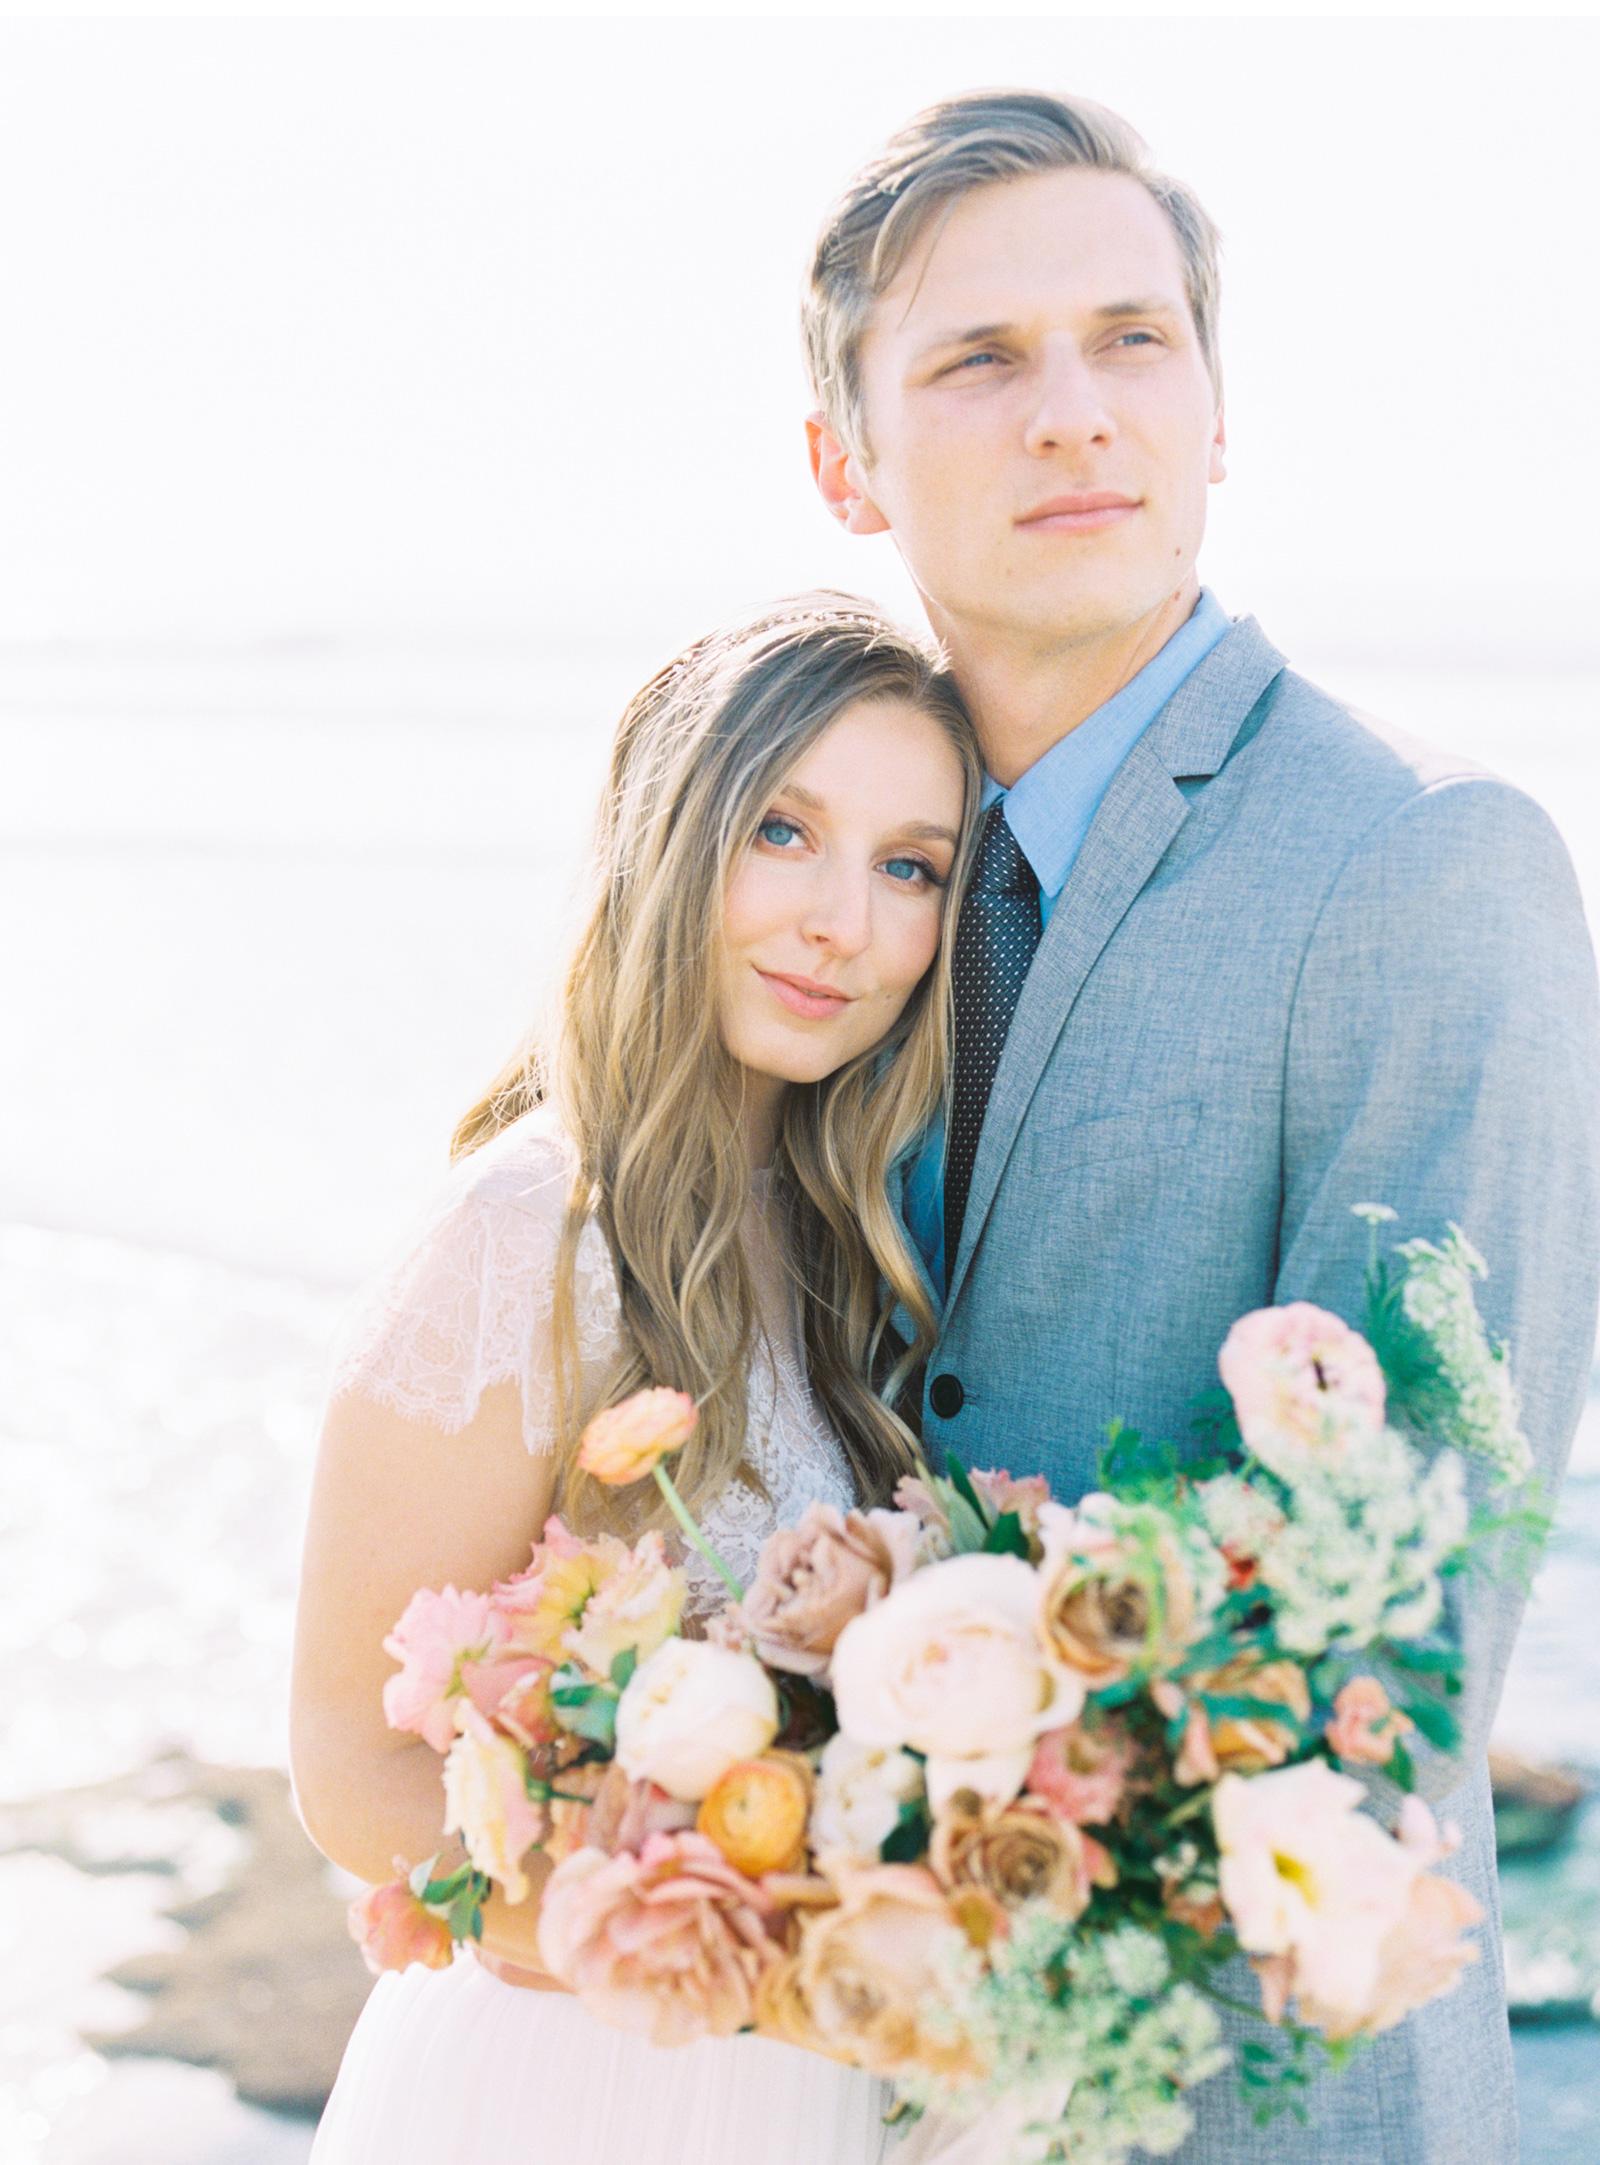 Hawaii-Fine-Art-Wedding-Photographer-Natalie-Schutt-Photography-Style-Me-Pretty_04.jpg